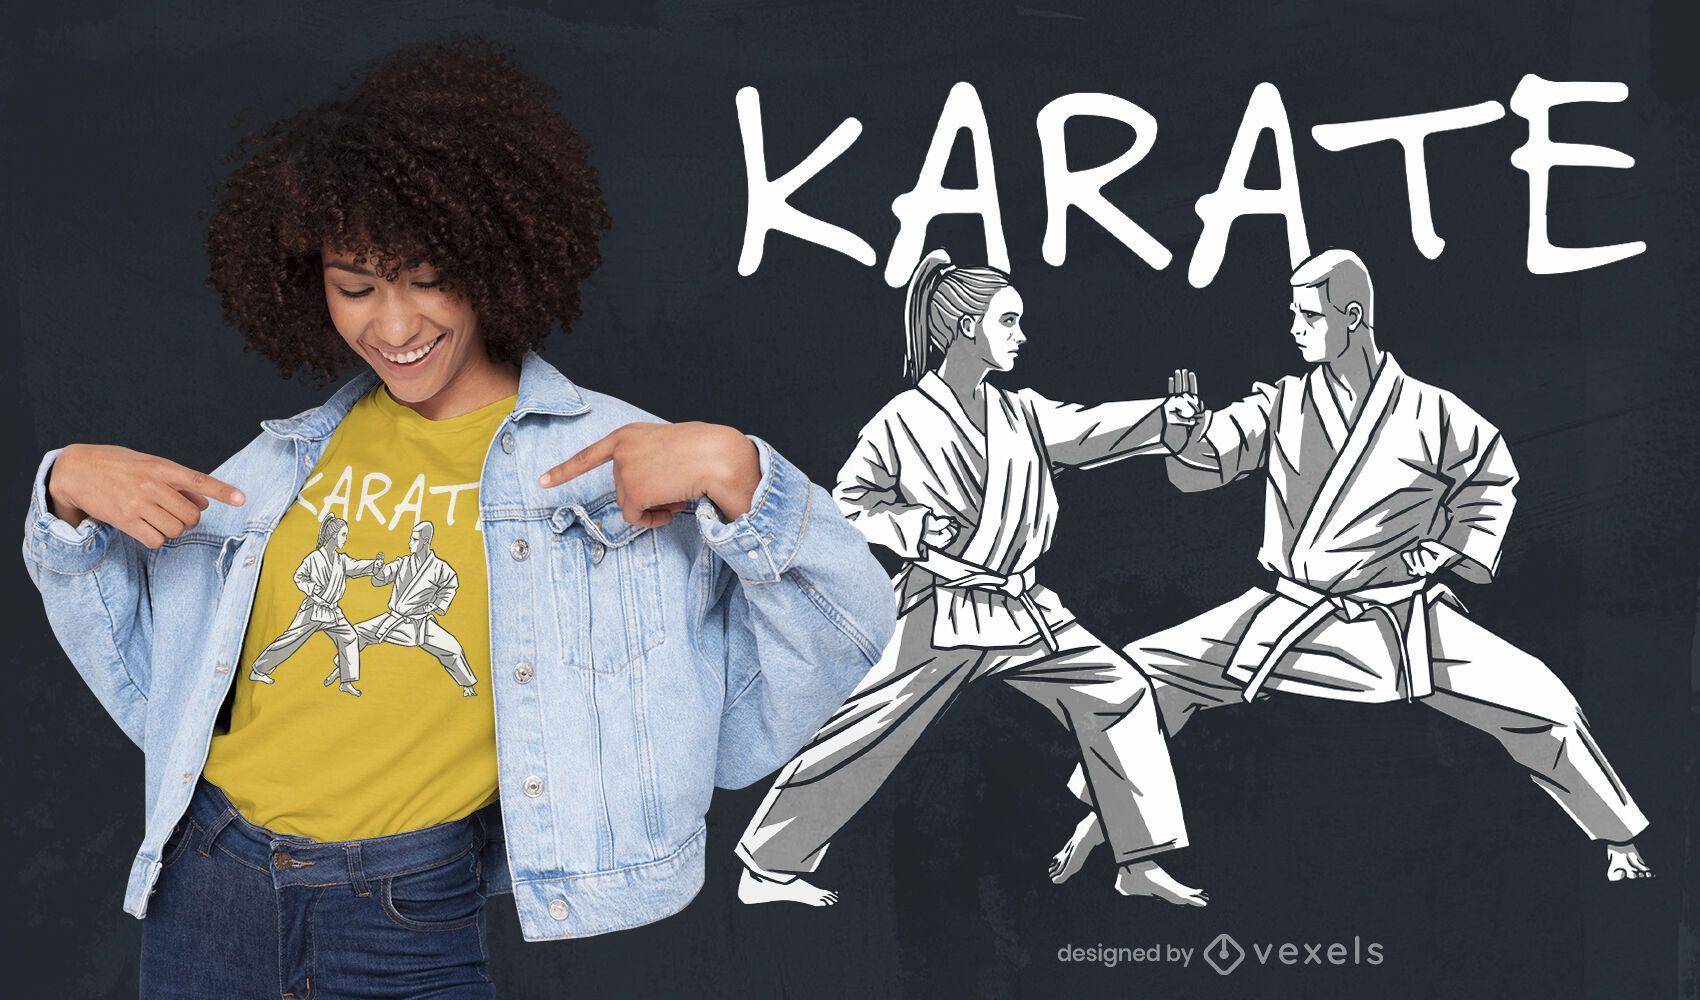 Karate people martial arts t-shirt design